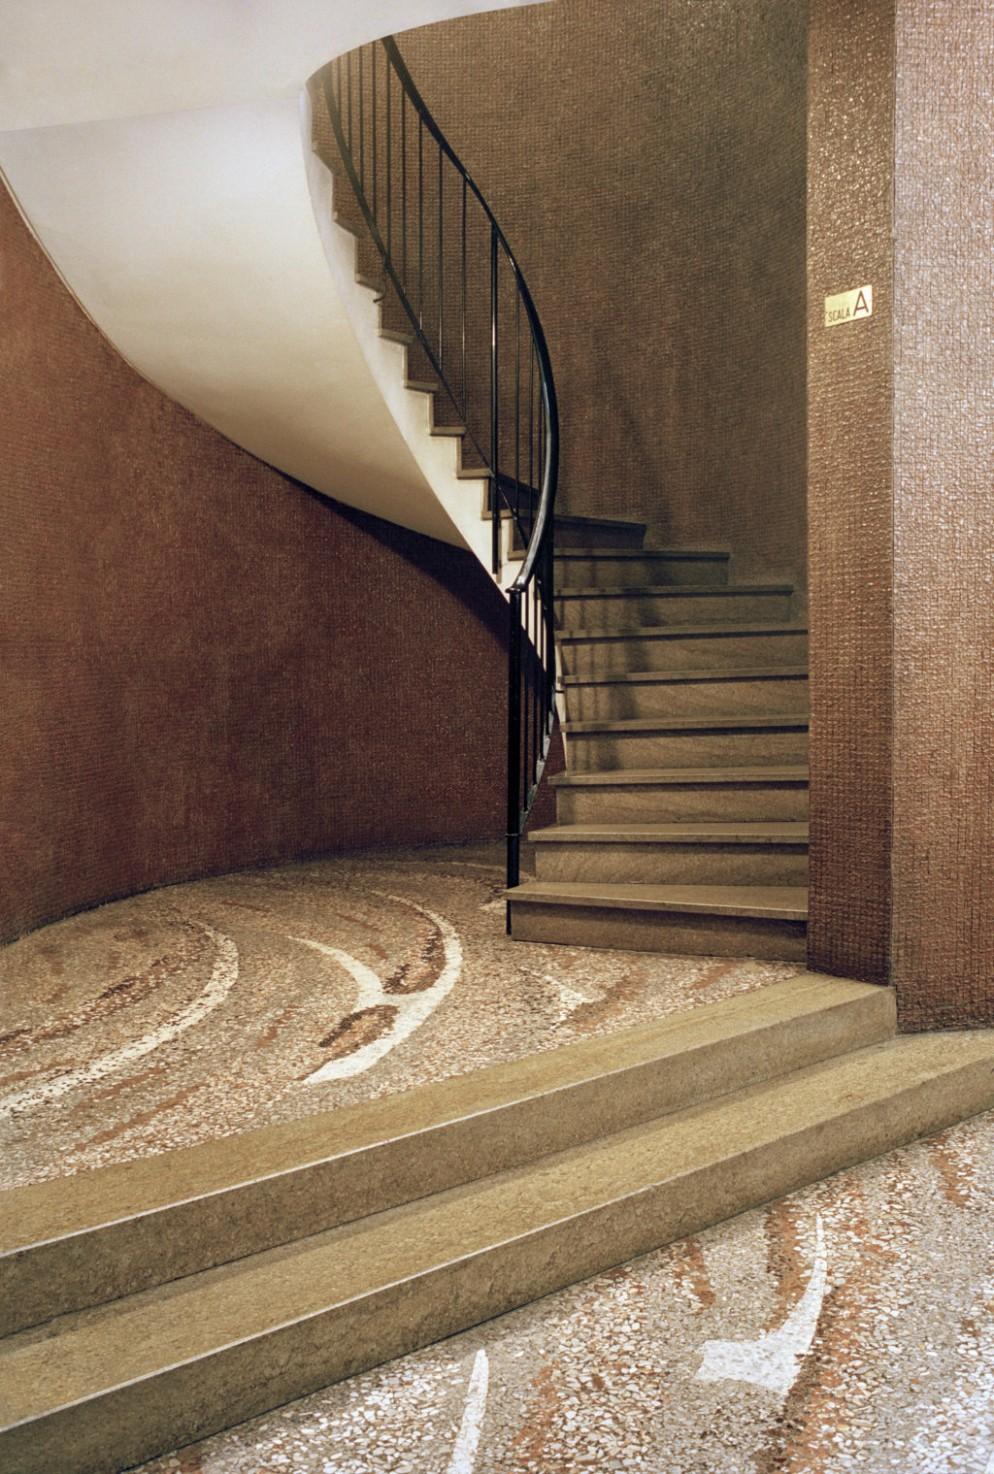 milano-architettura-044 -ph_stefan-giftthaler-livingcorriere